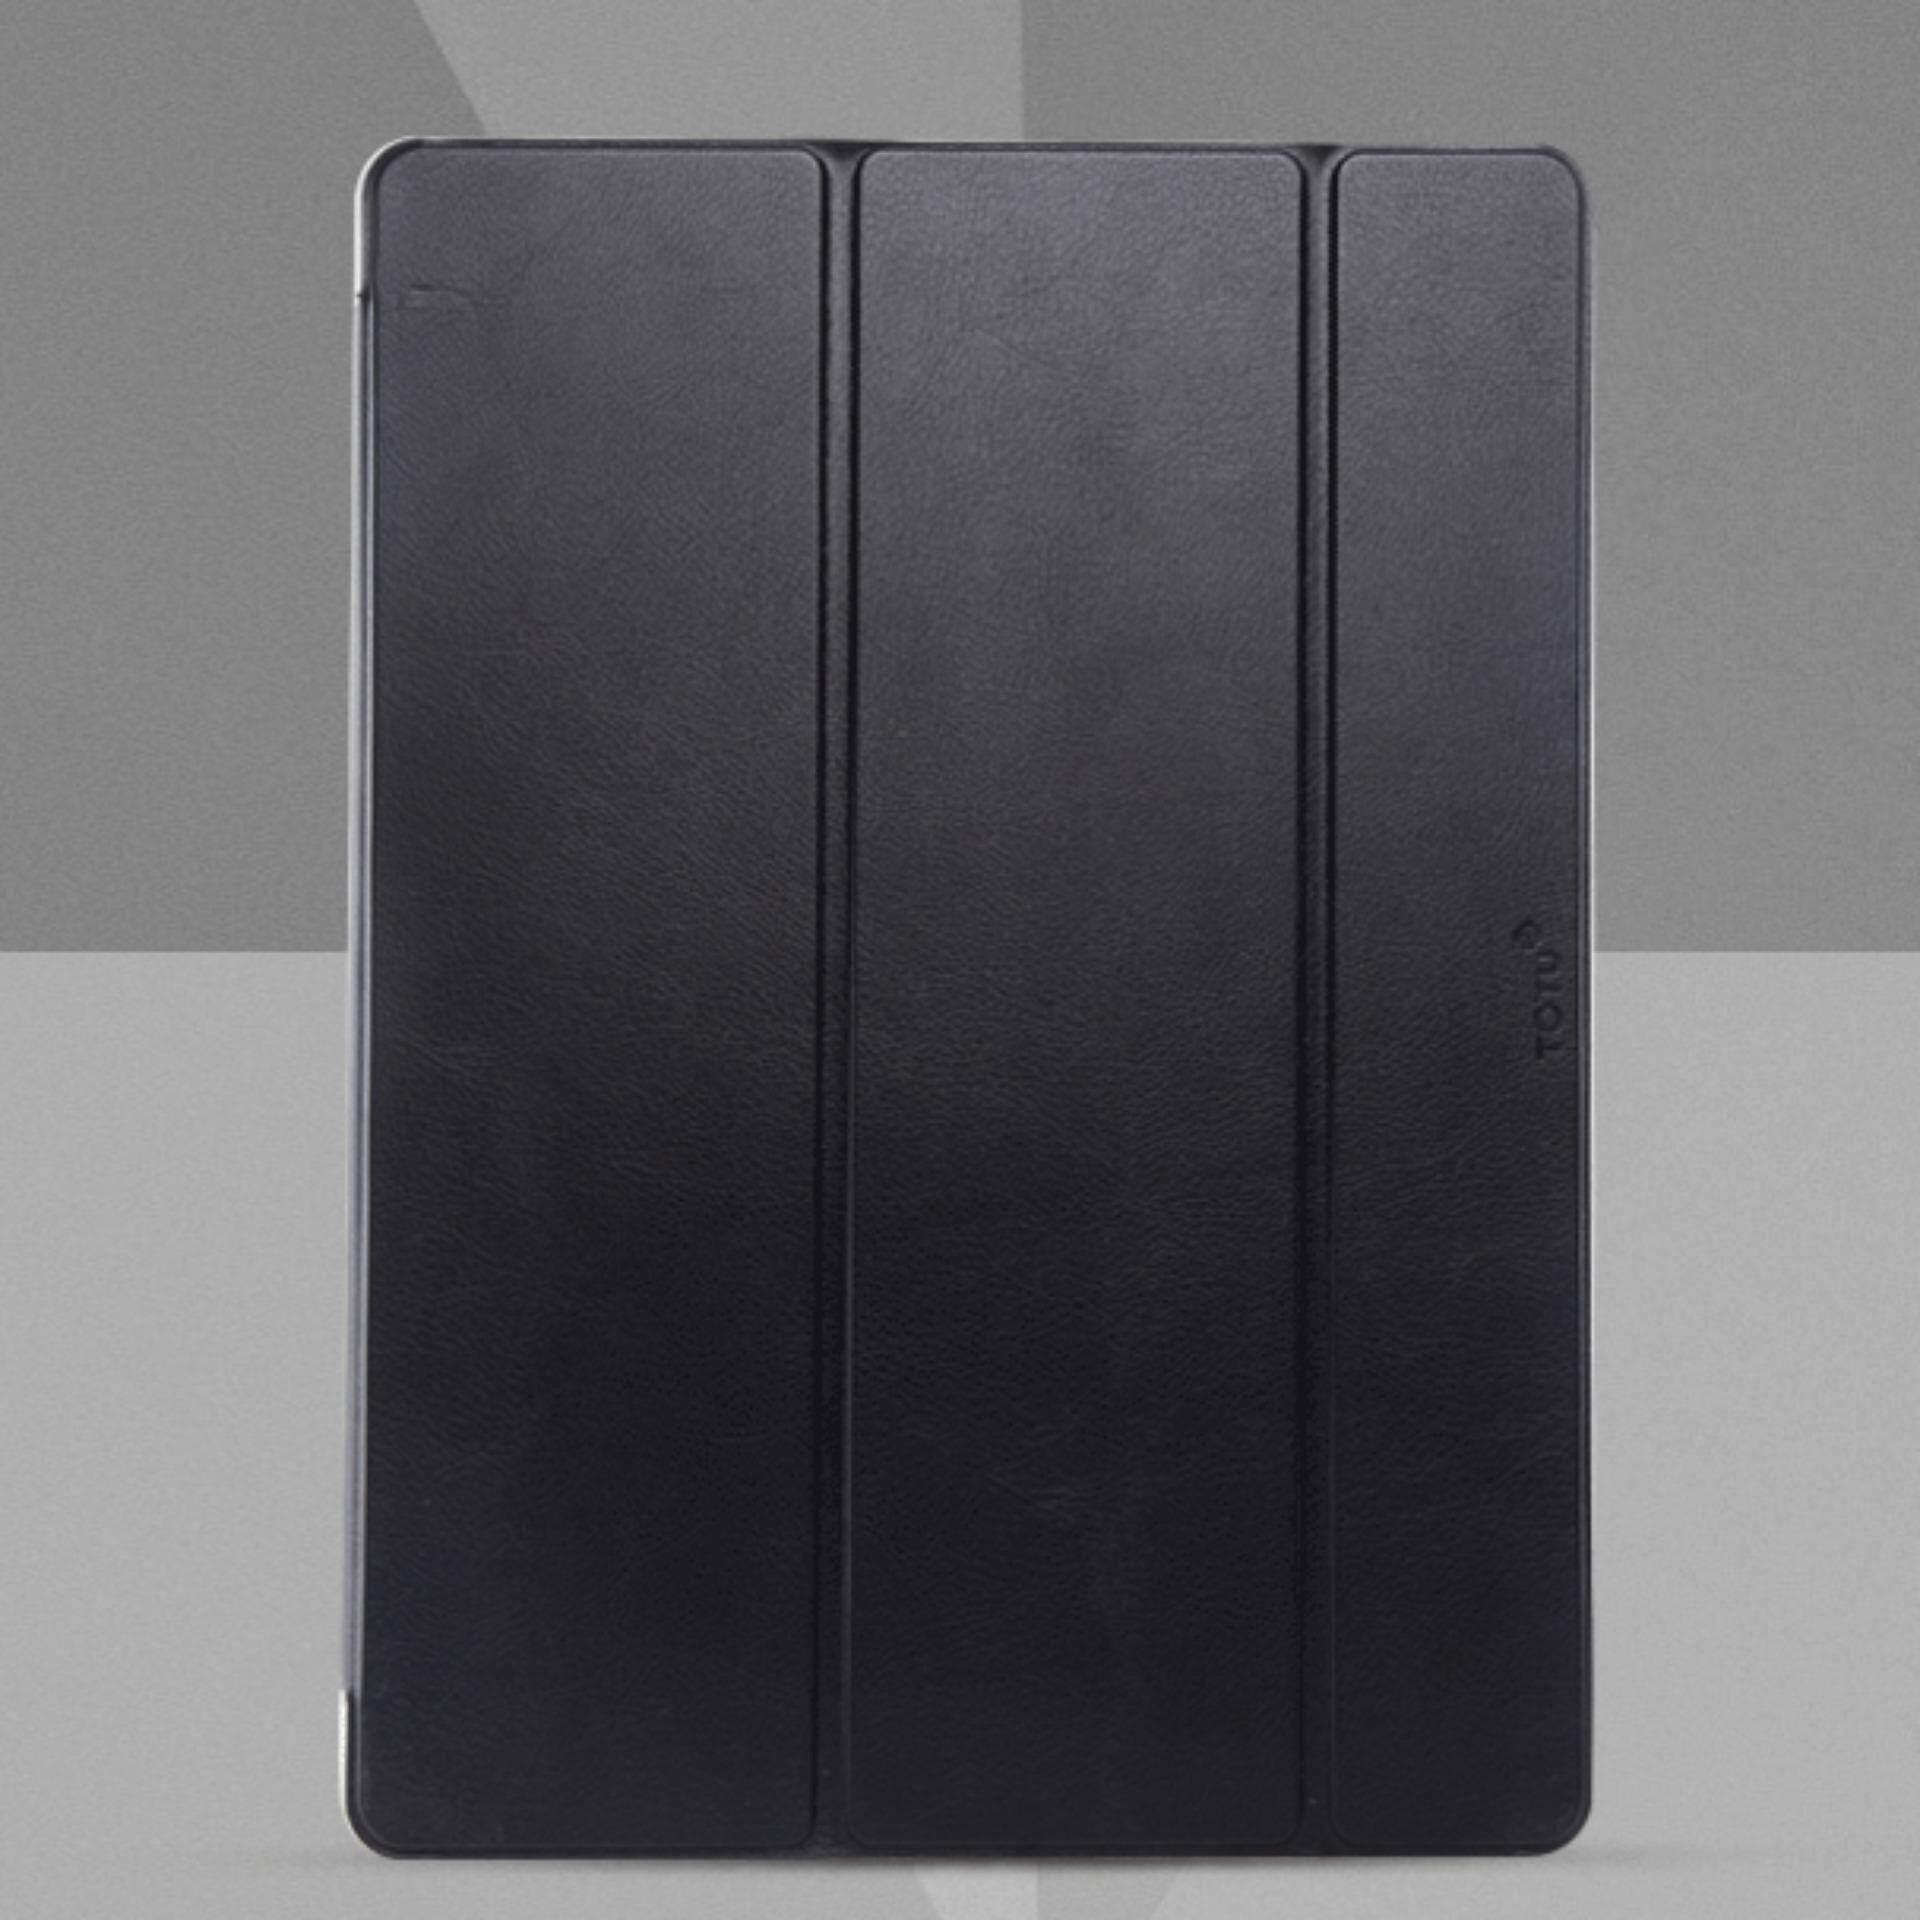 TUTU Design Smart Thin Cover Case For Apple iPad Pro 12.9 inch (สีดำ)